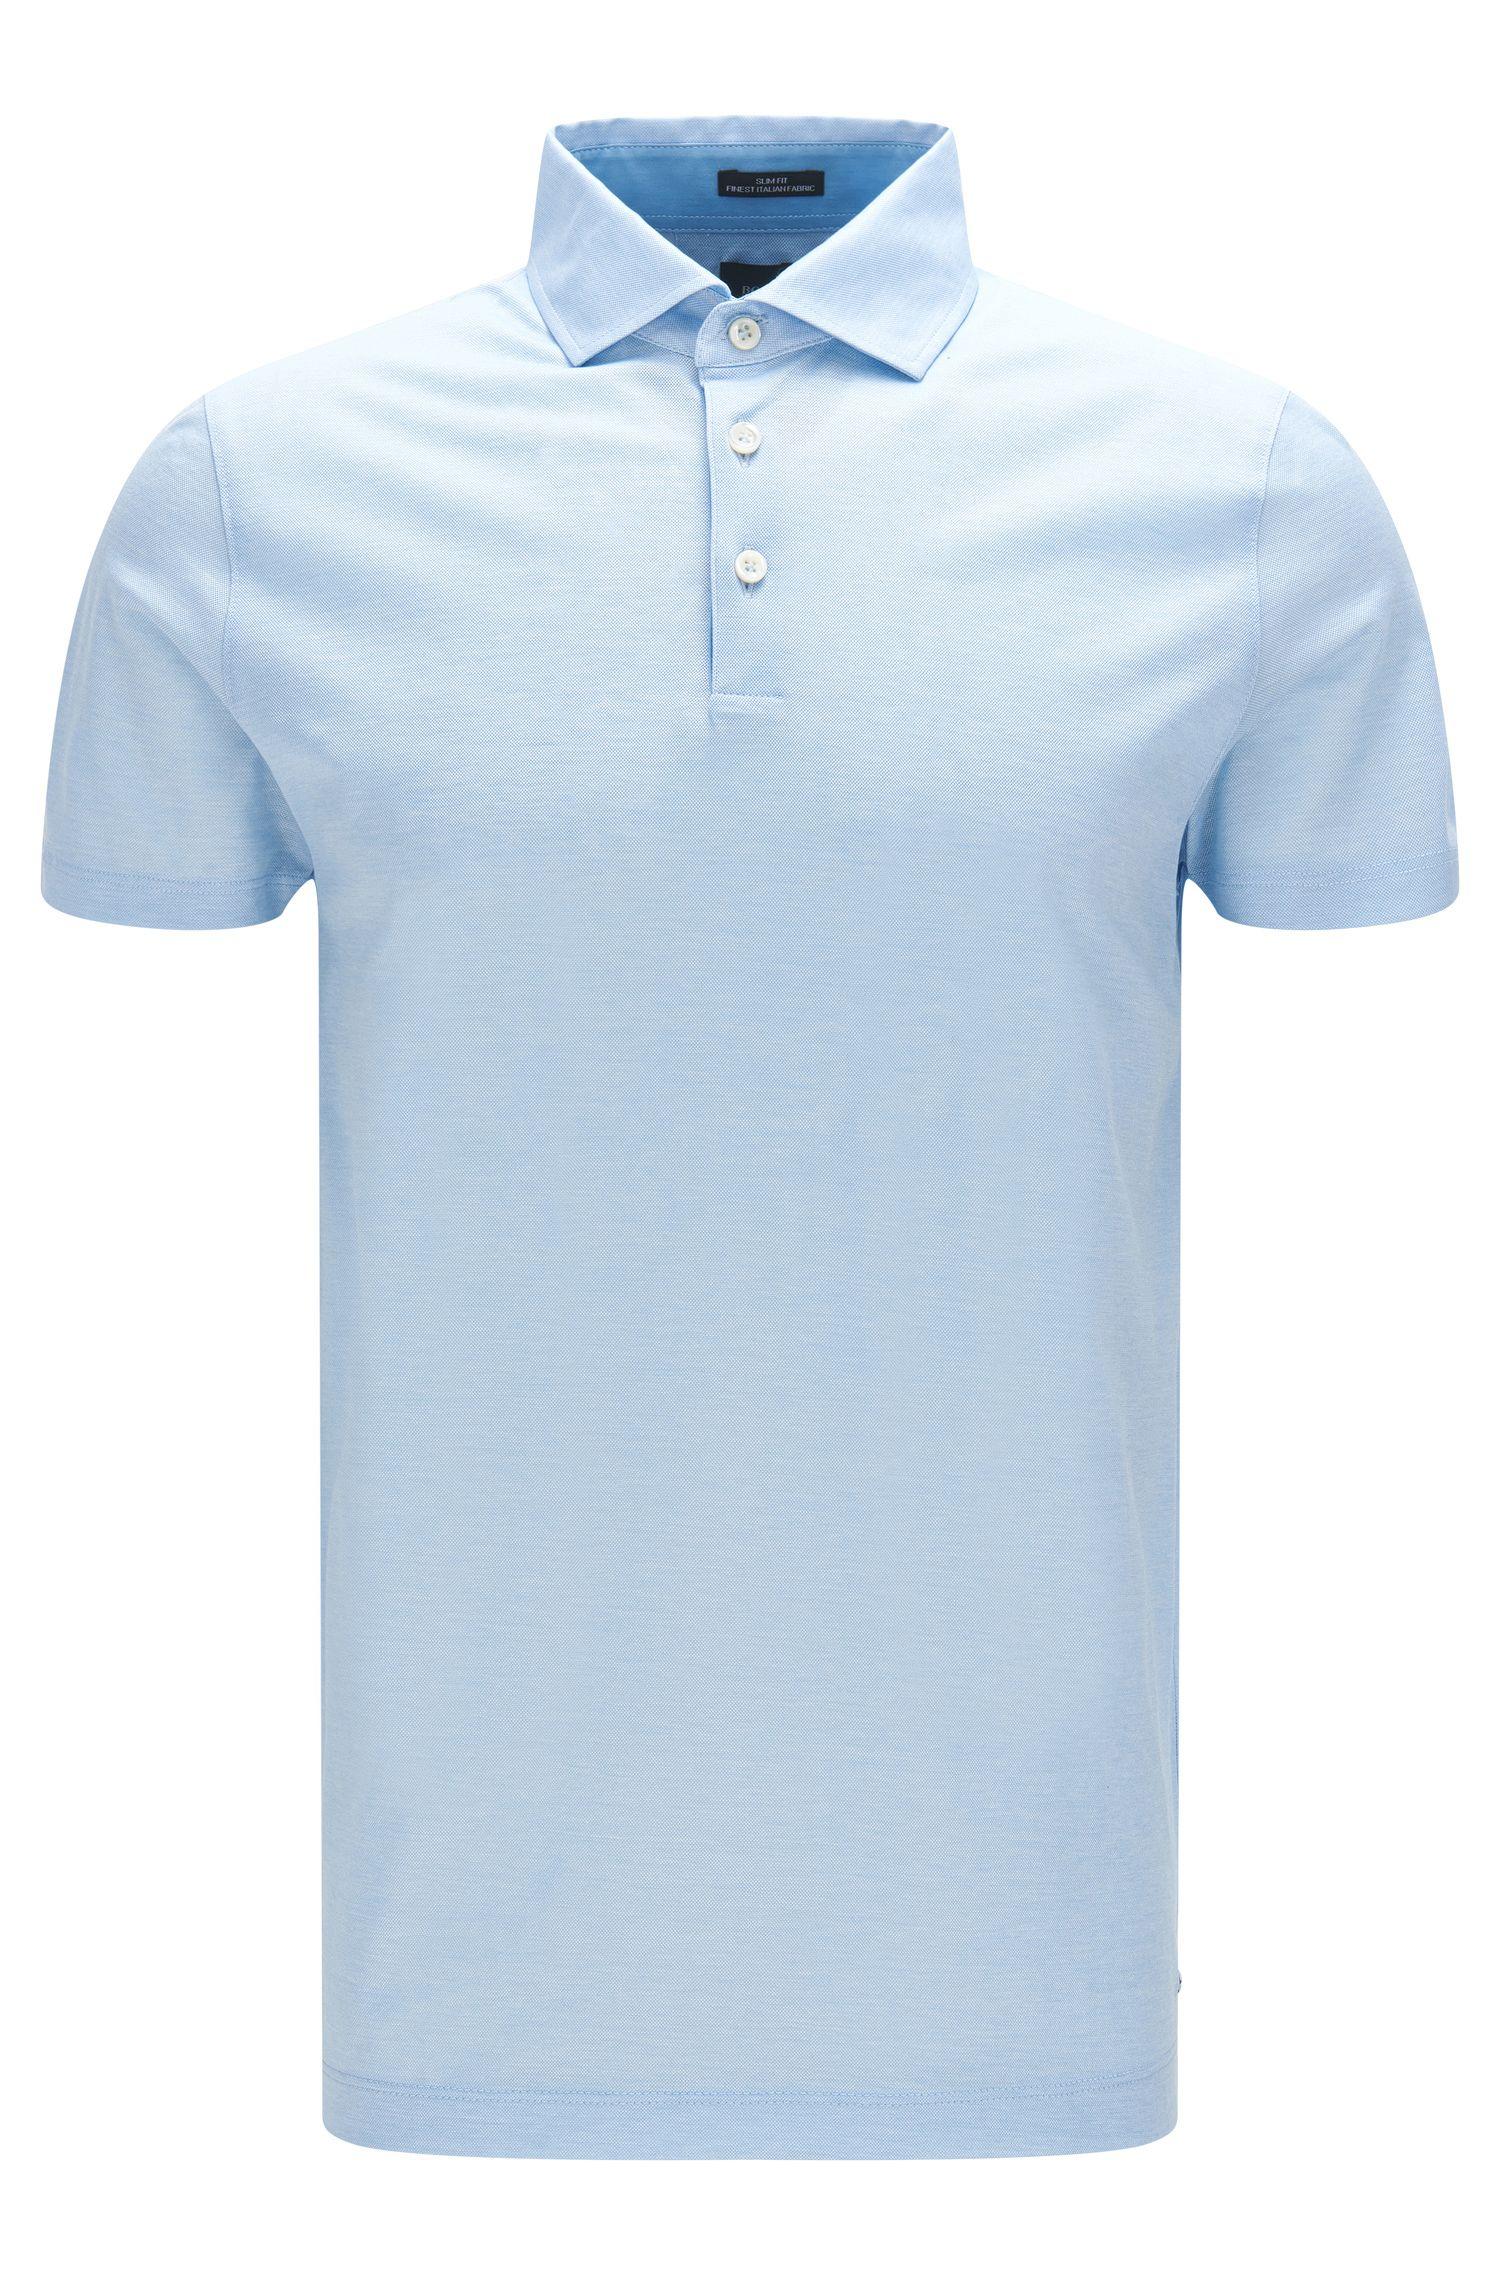 'T-Pryde'   Slim Fit, Italian Cotton Jacquard Polo Shirt